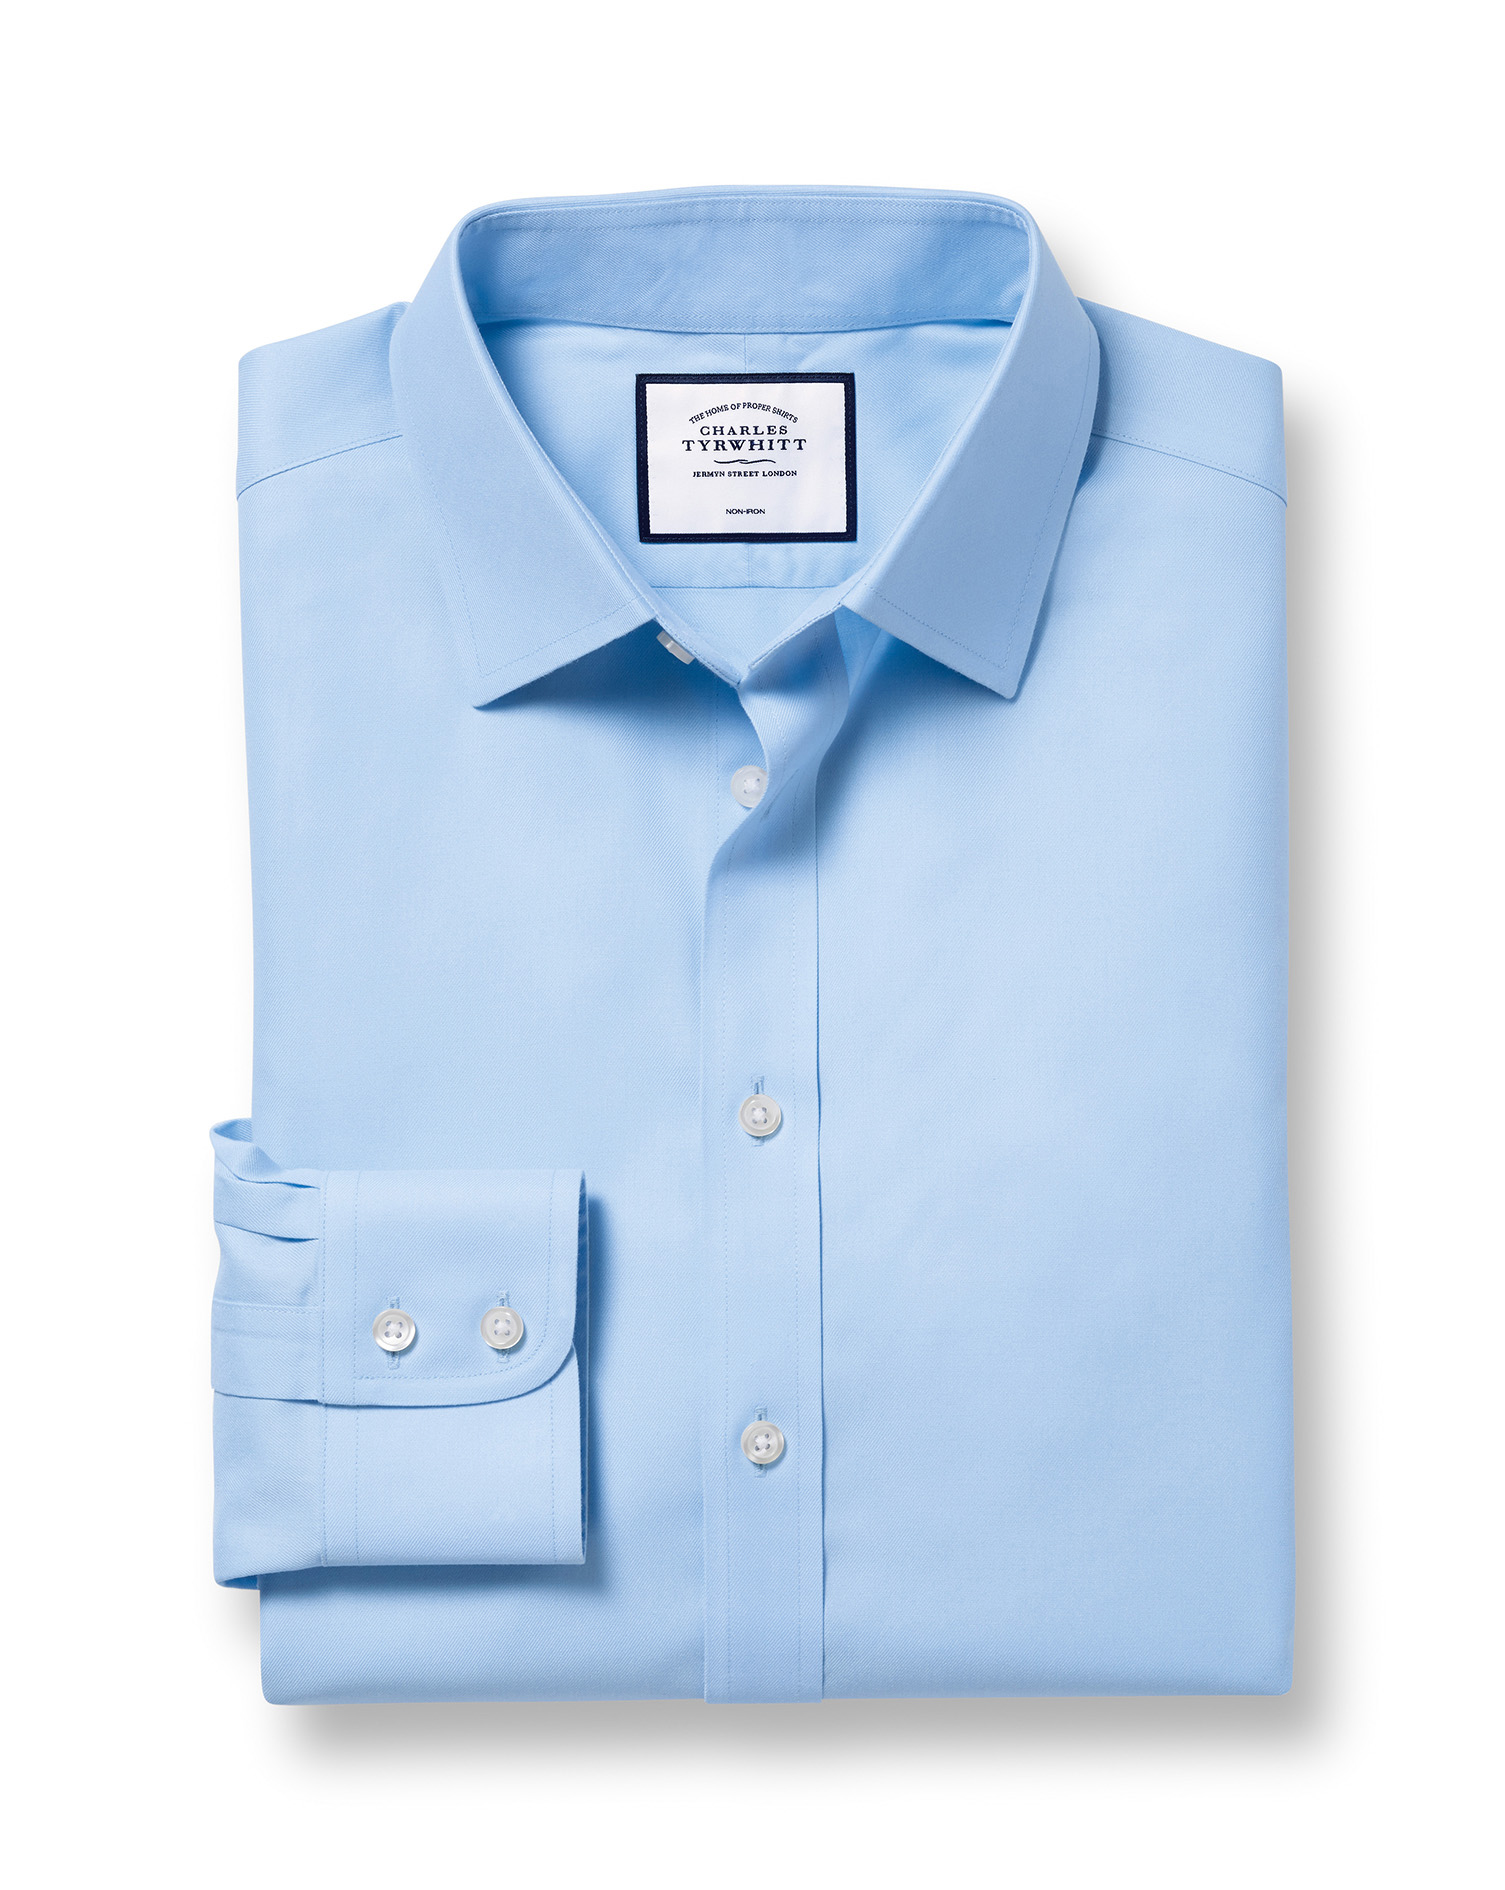 Slim Fit Sky Blue Non-Iron Twill Cotton Formal Shirt Single Cuff Size 16/33 by Charles Tyrwhitt